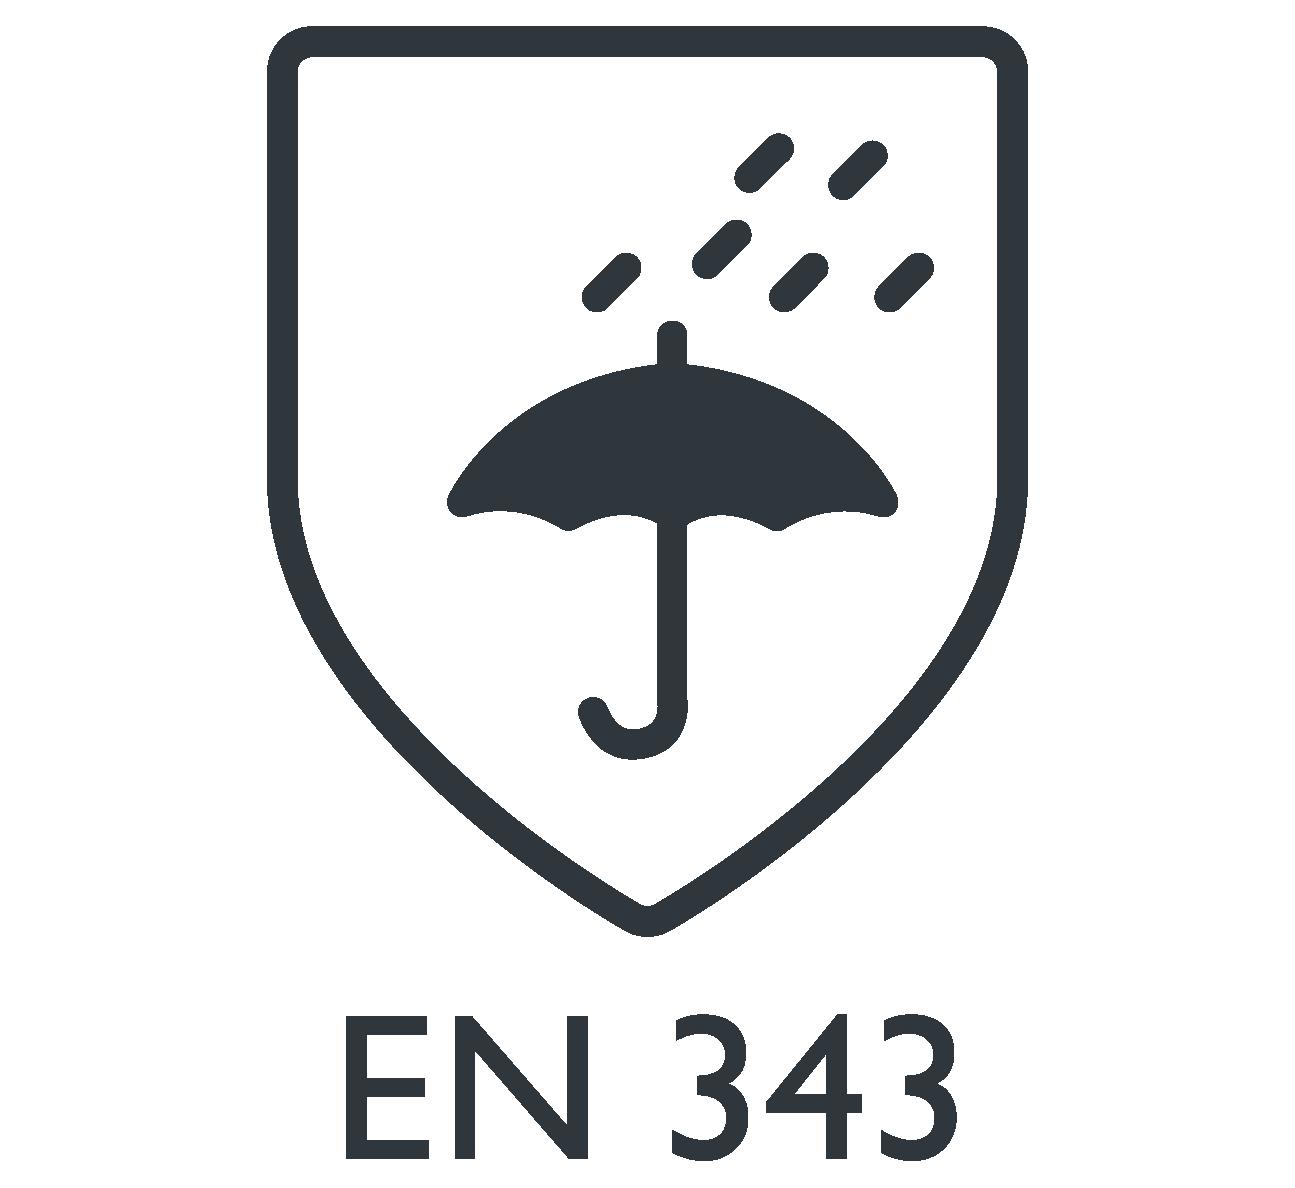 EN 343 rain protective clothing